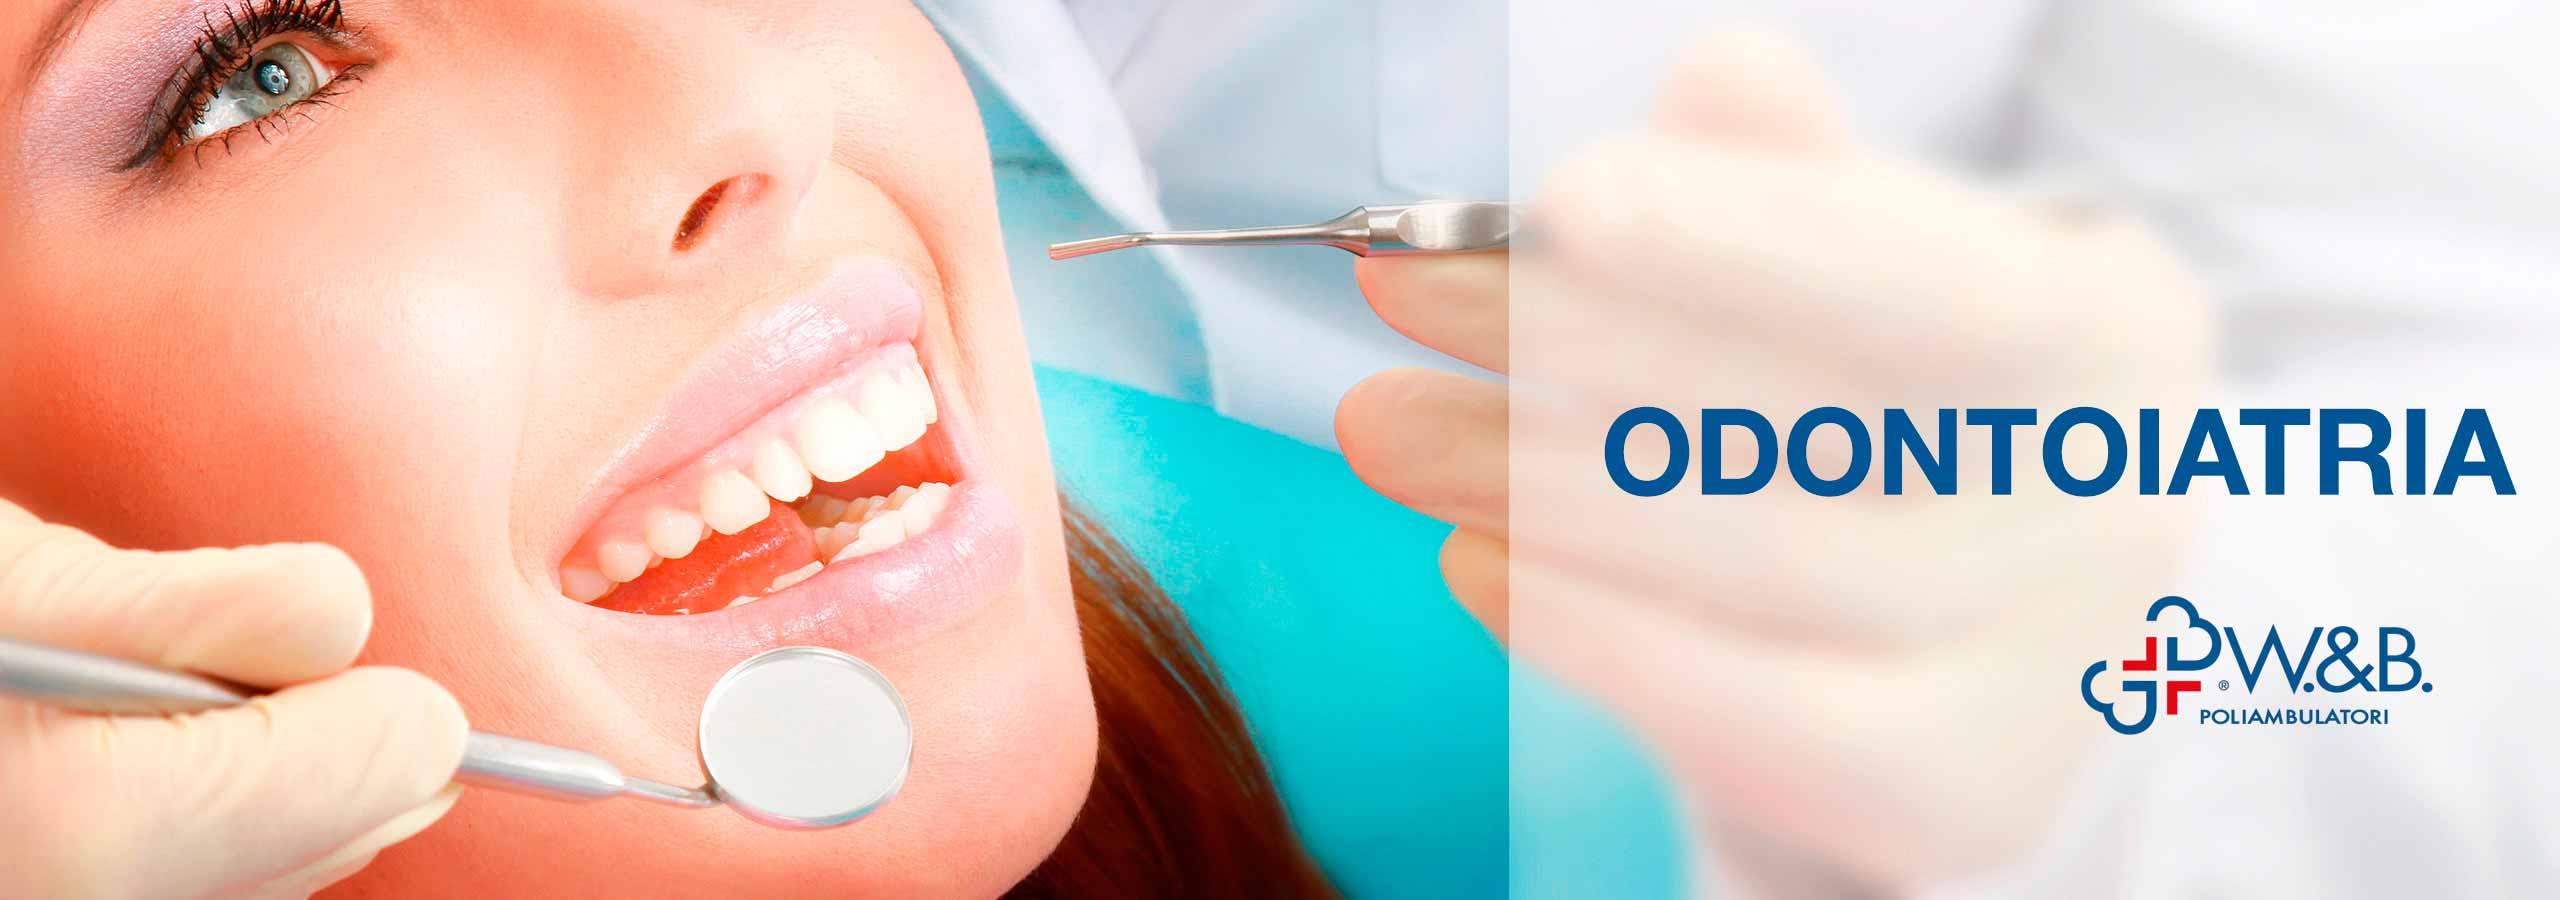 slide_odontoiatria